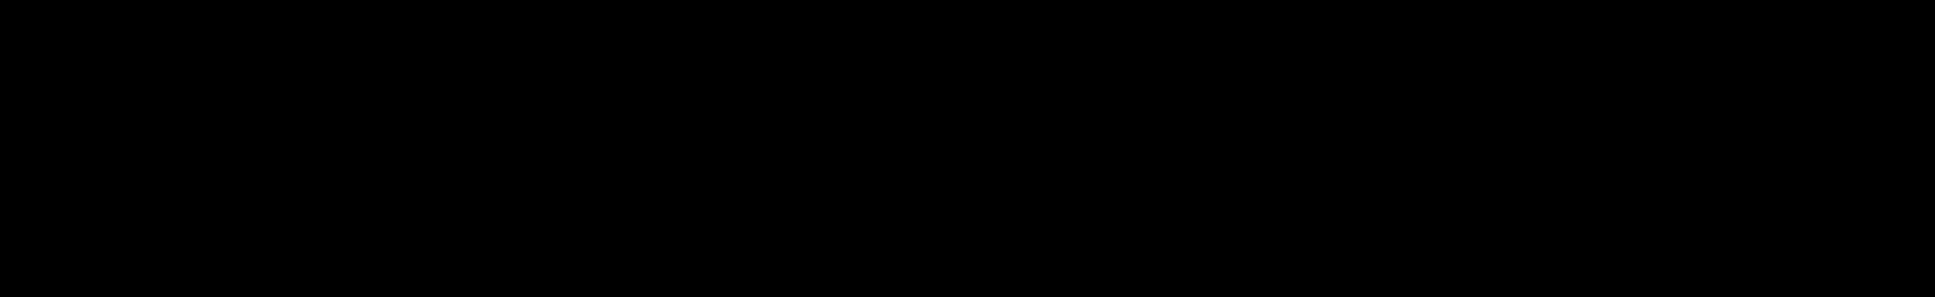 IFKIHON